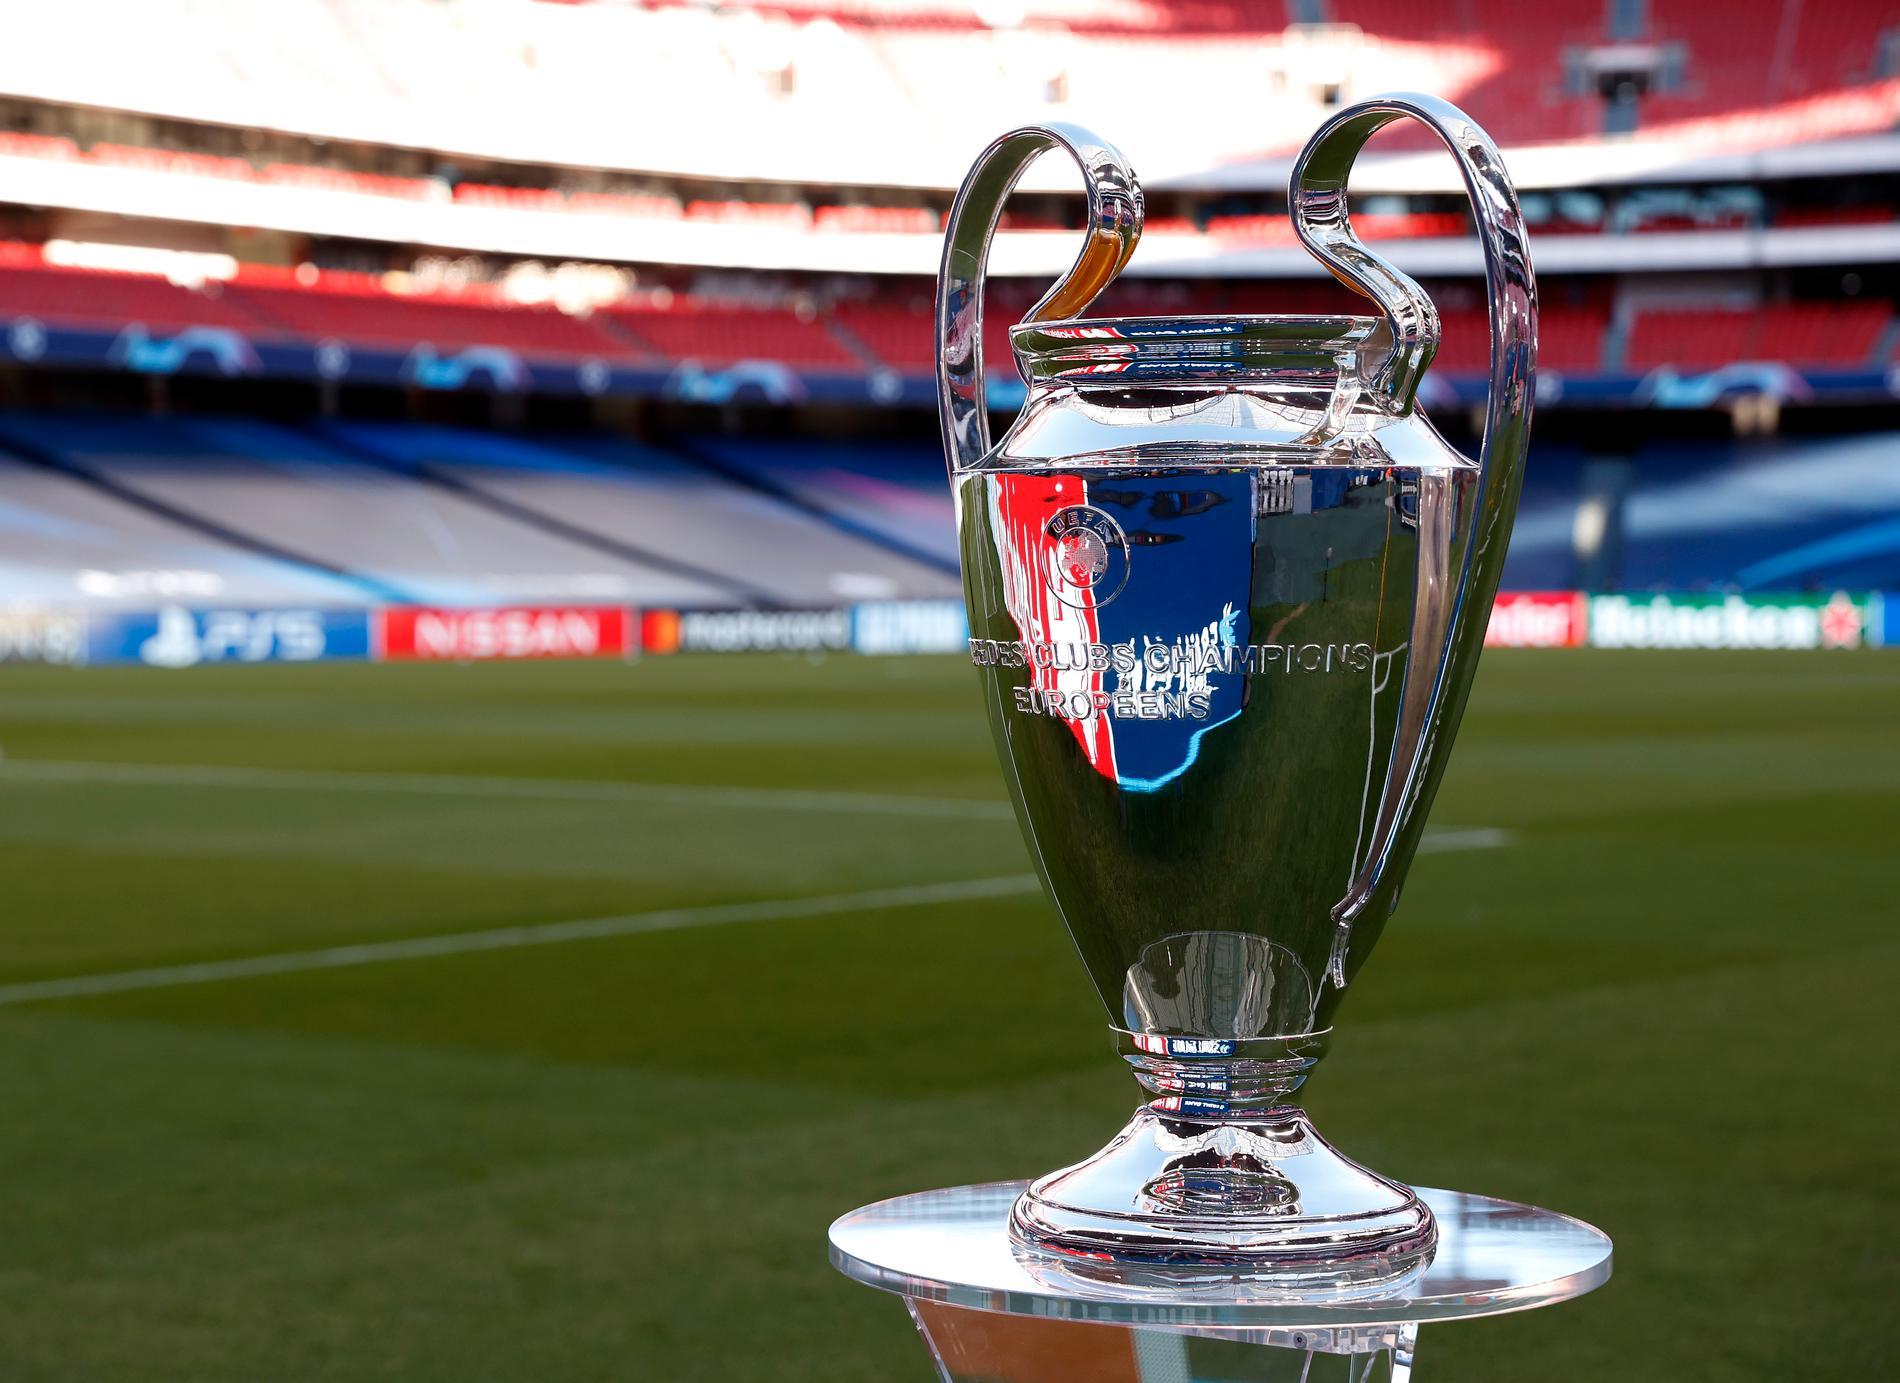 Champions League-finalen 2021 spelas 29 maj i Porto.